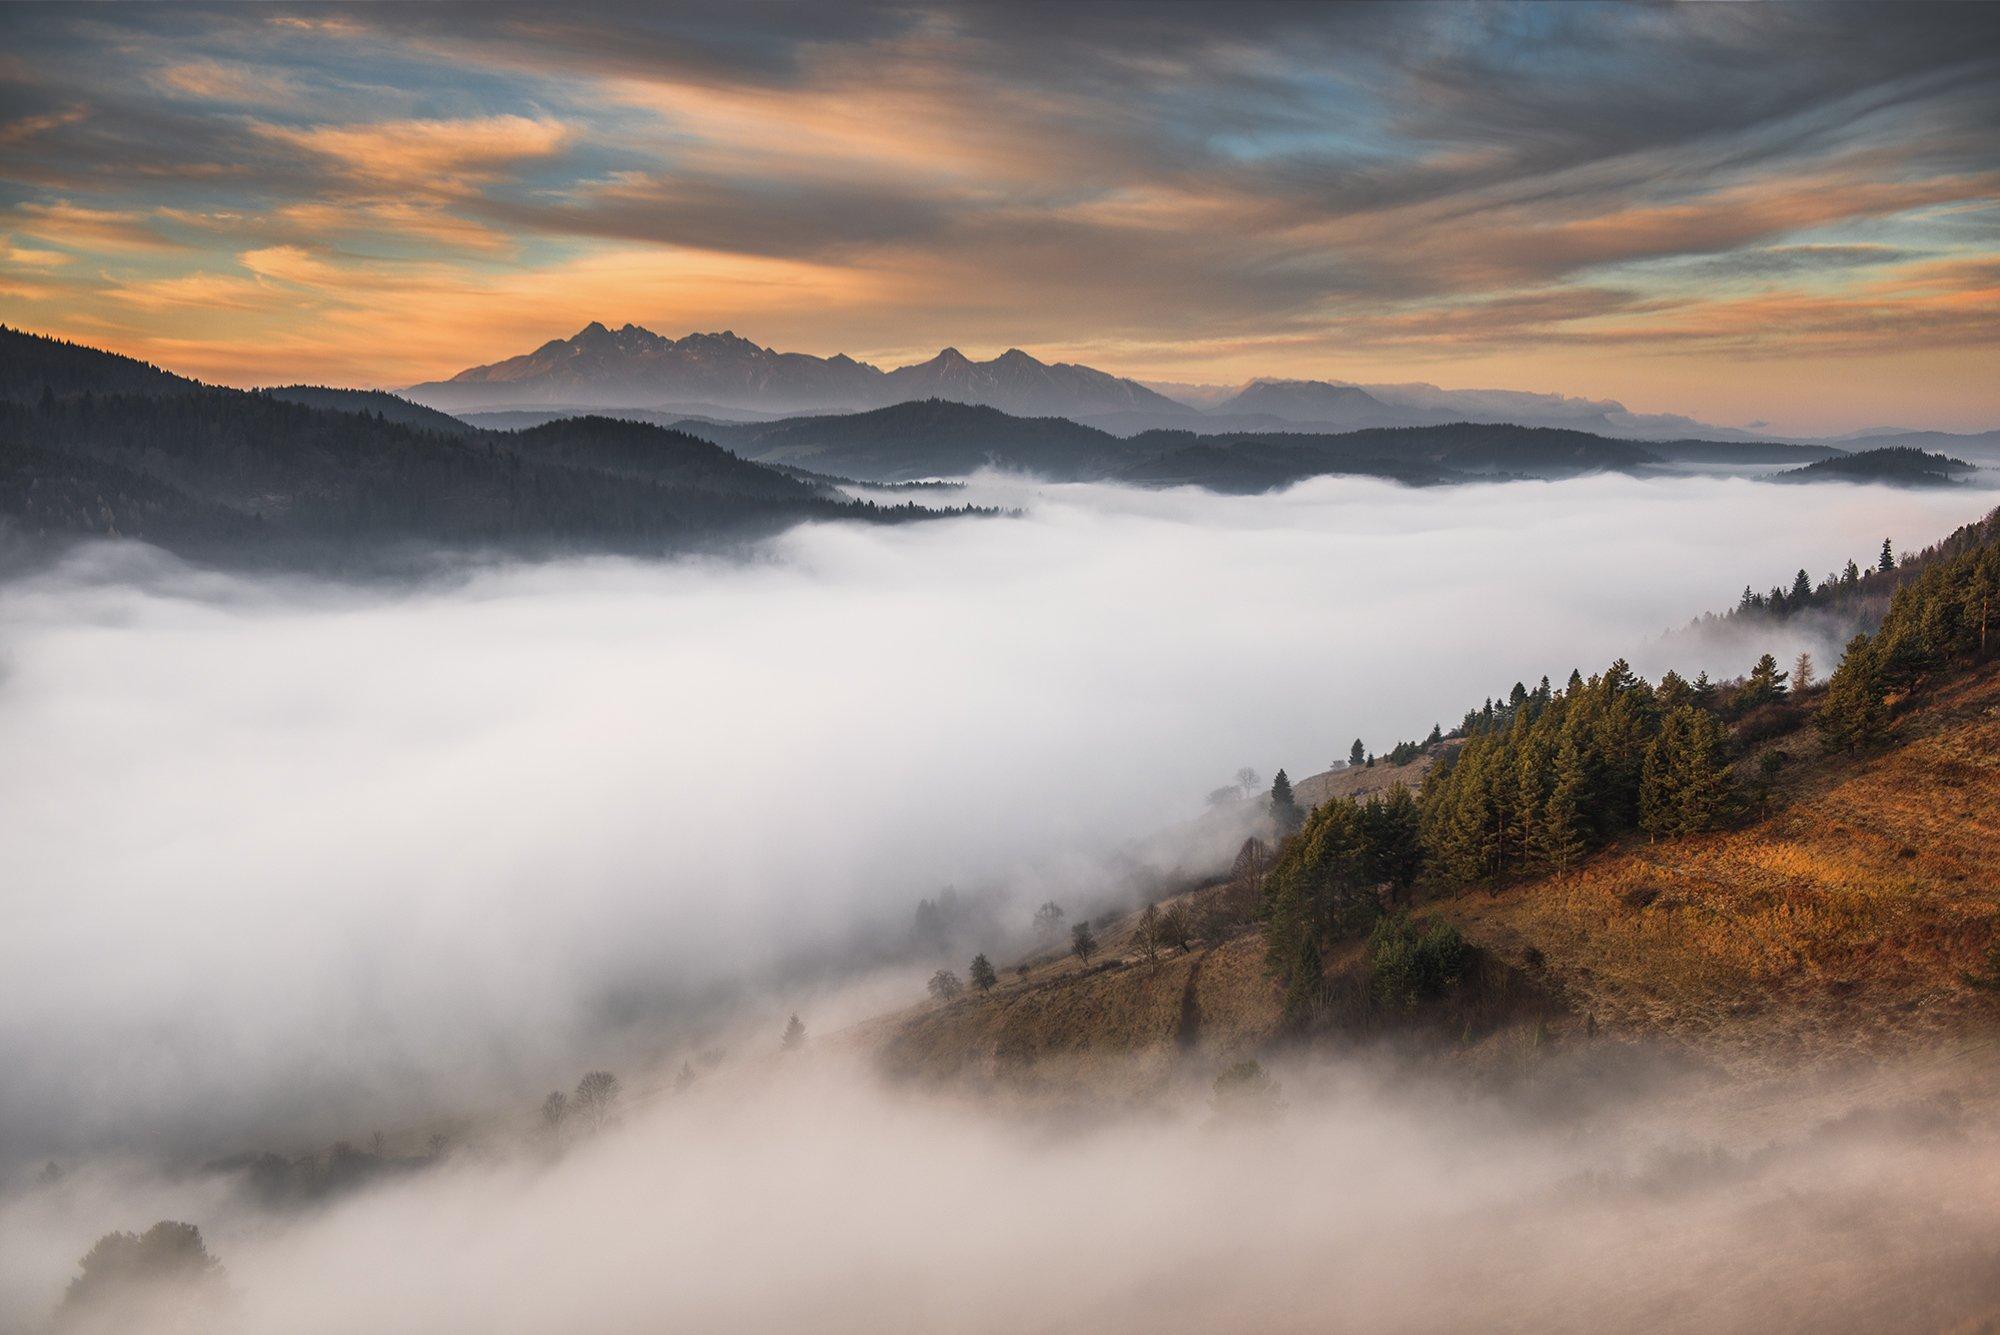 mountains, poland, slovakia, tatry, pieniny, light, surise, sun, light, landscape, hills, warm, colors, winter,, Bieganski Patryk